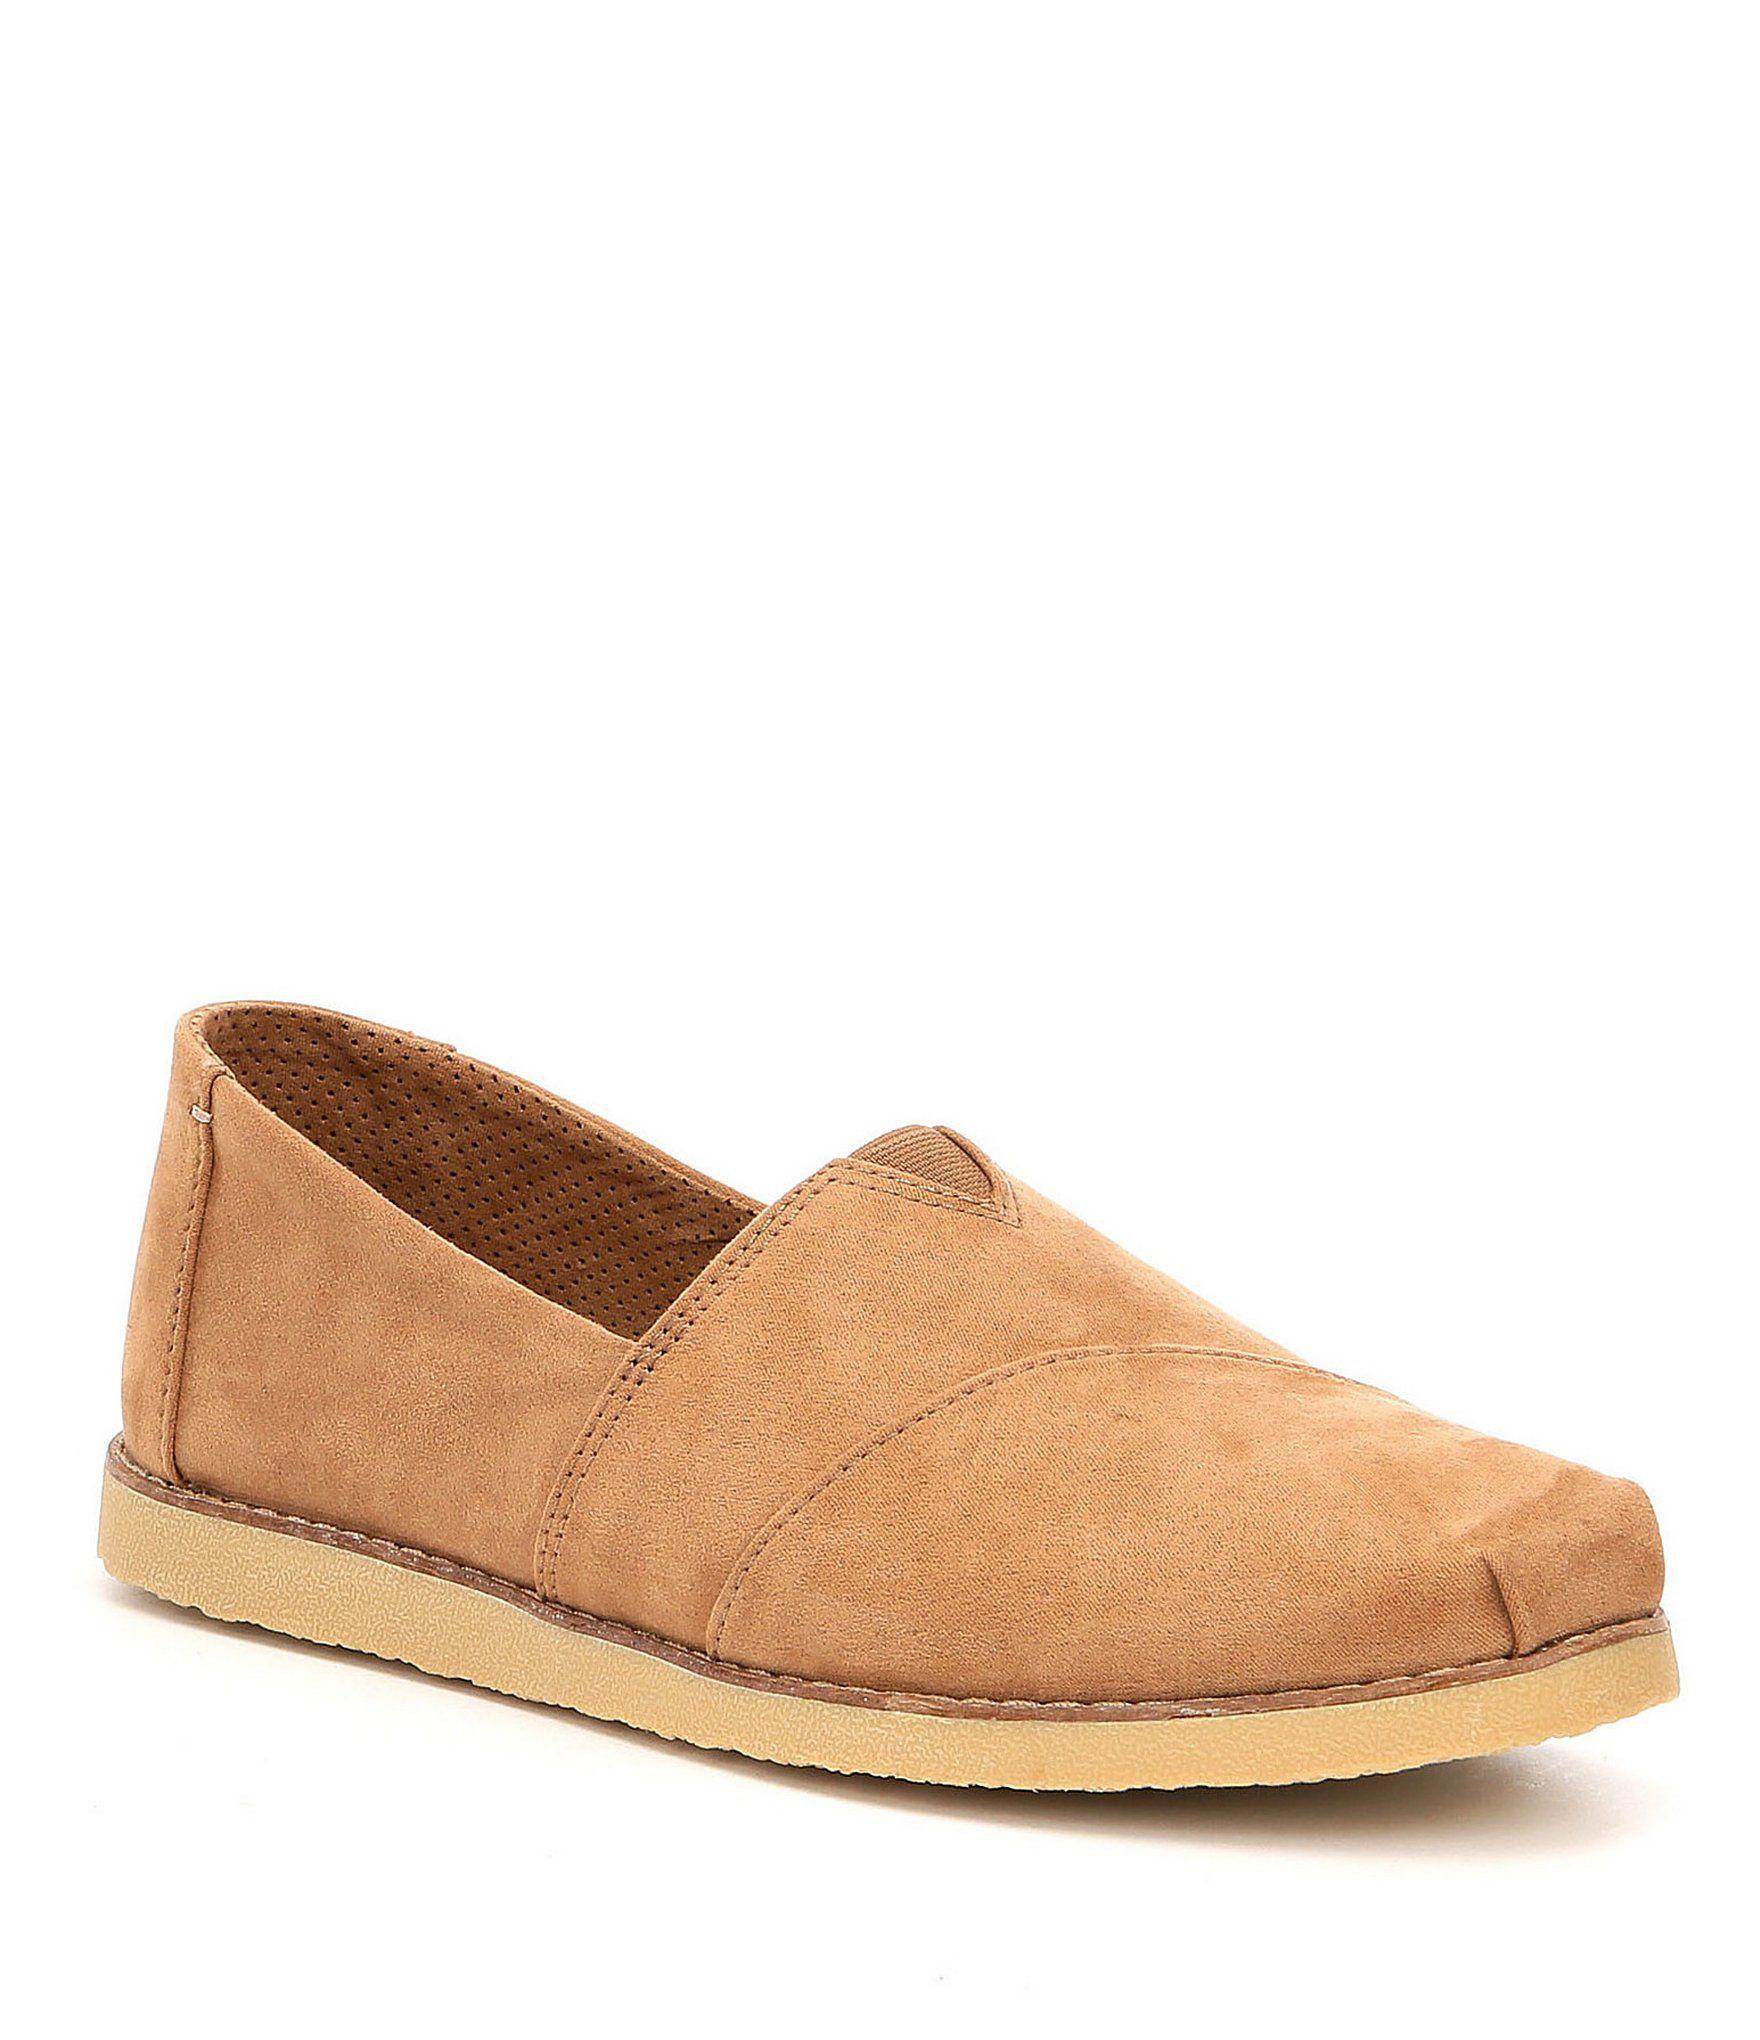 TOMS Alpargata Crepe Slip-Ons #Dillards